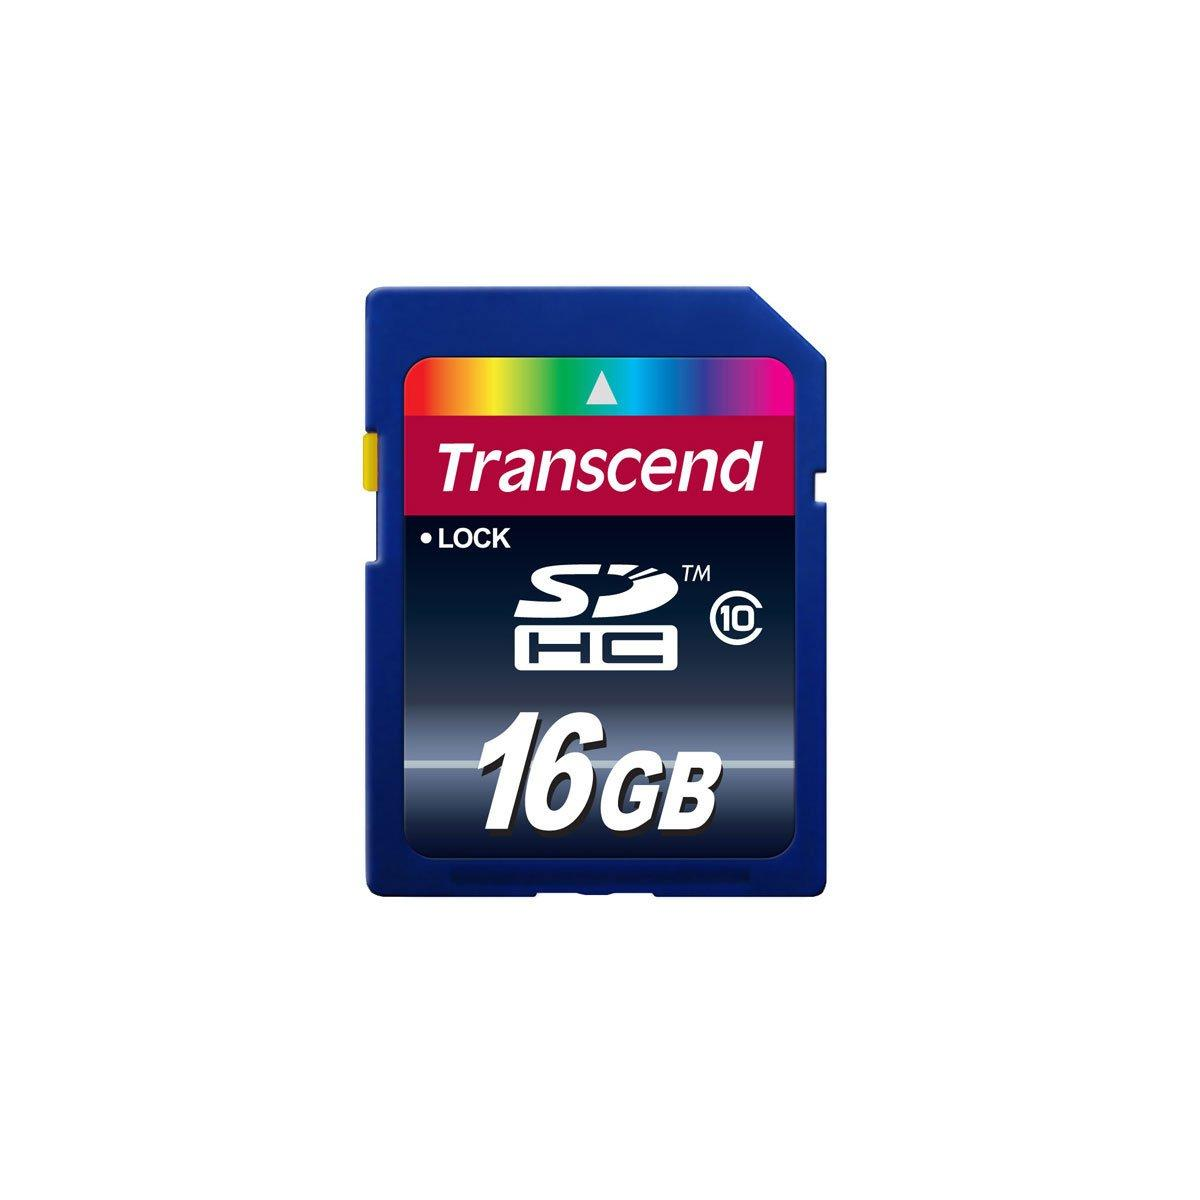 Transcend SDHC CLASS 10 16GB